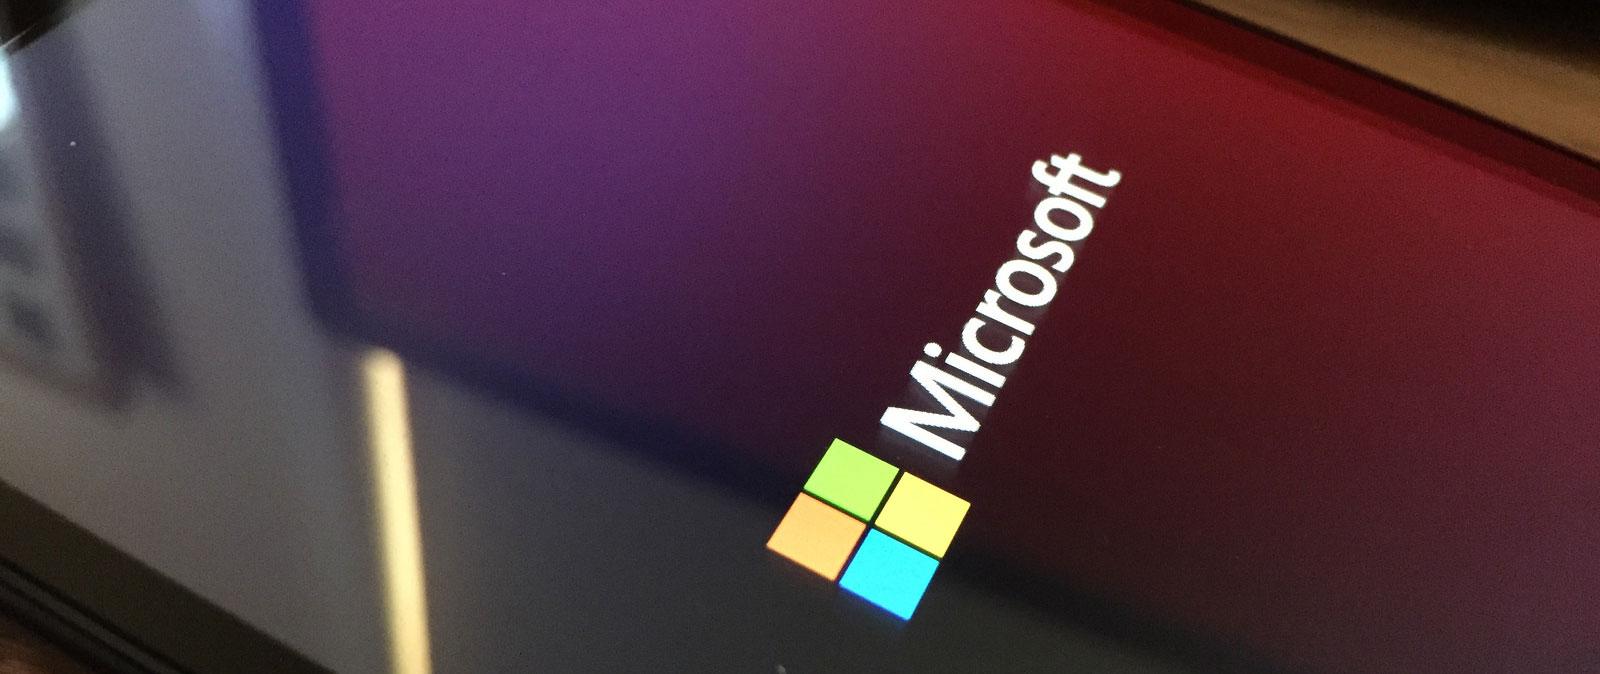 Microsoft boot logo